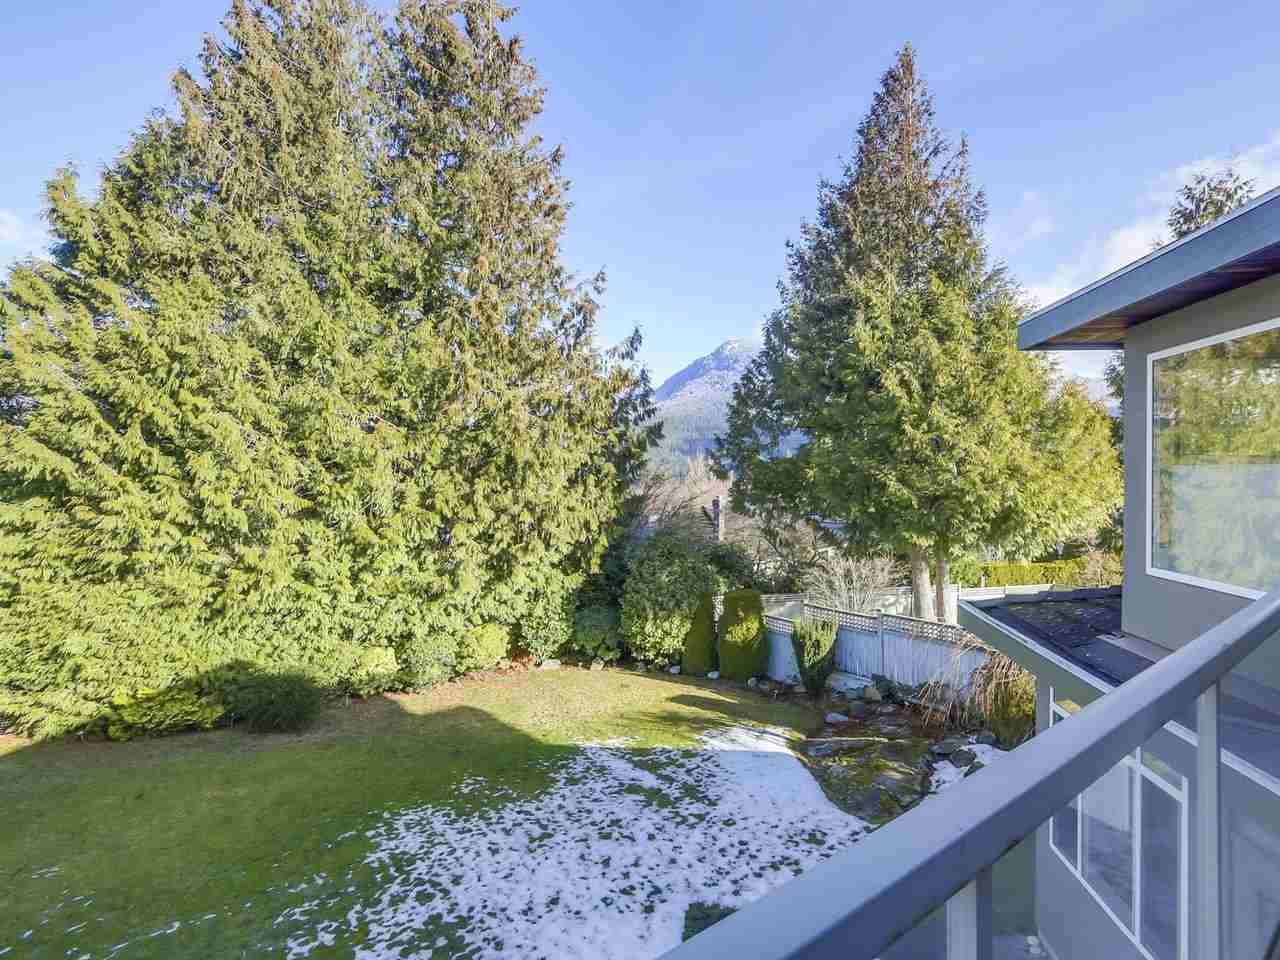 Photo 20: Photos: 5441 WEST VISTA COURT in West Vancouver: Upper Caulfeild House for sale : MLS®# R2341877